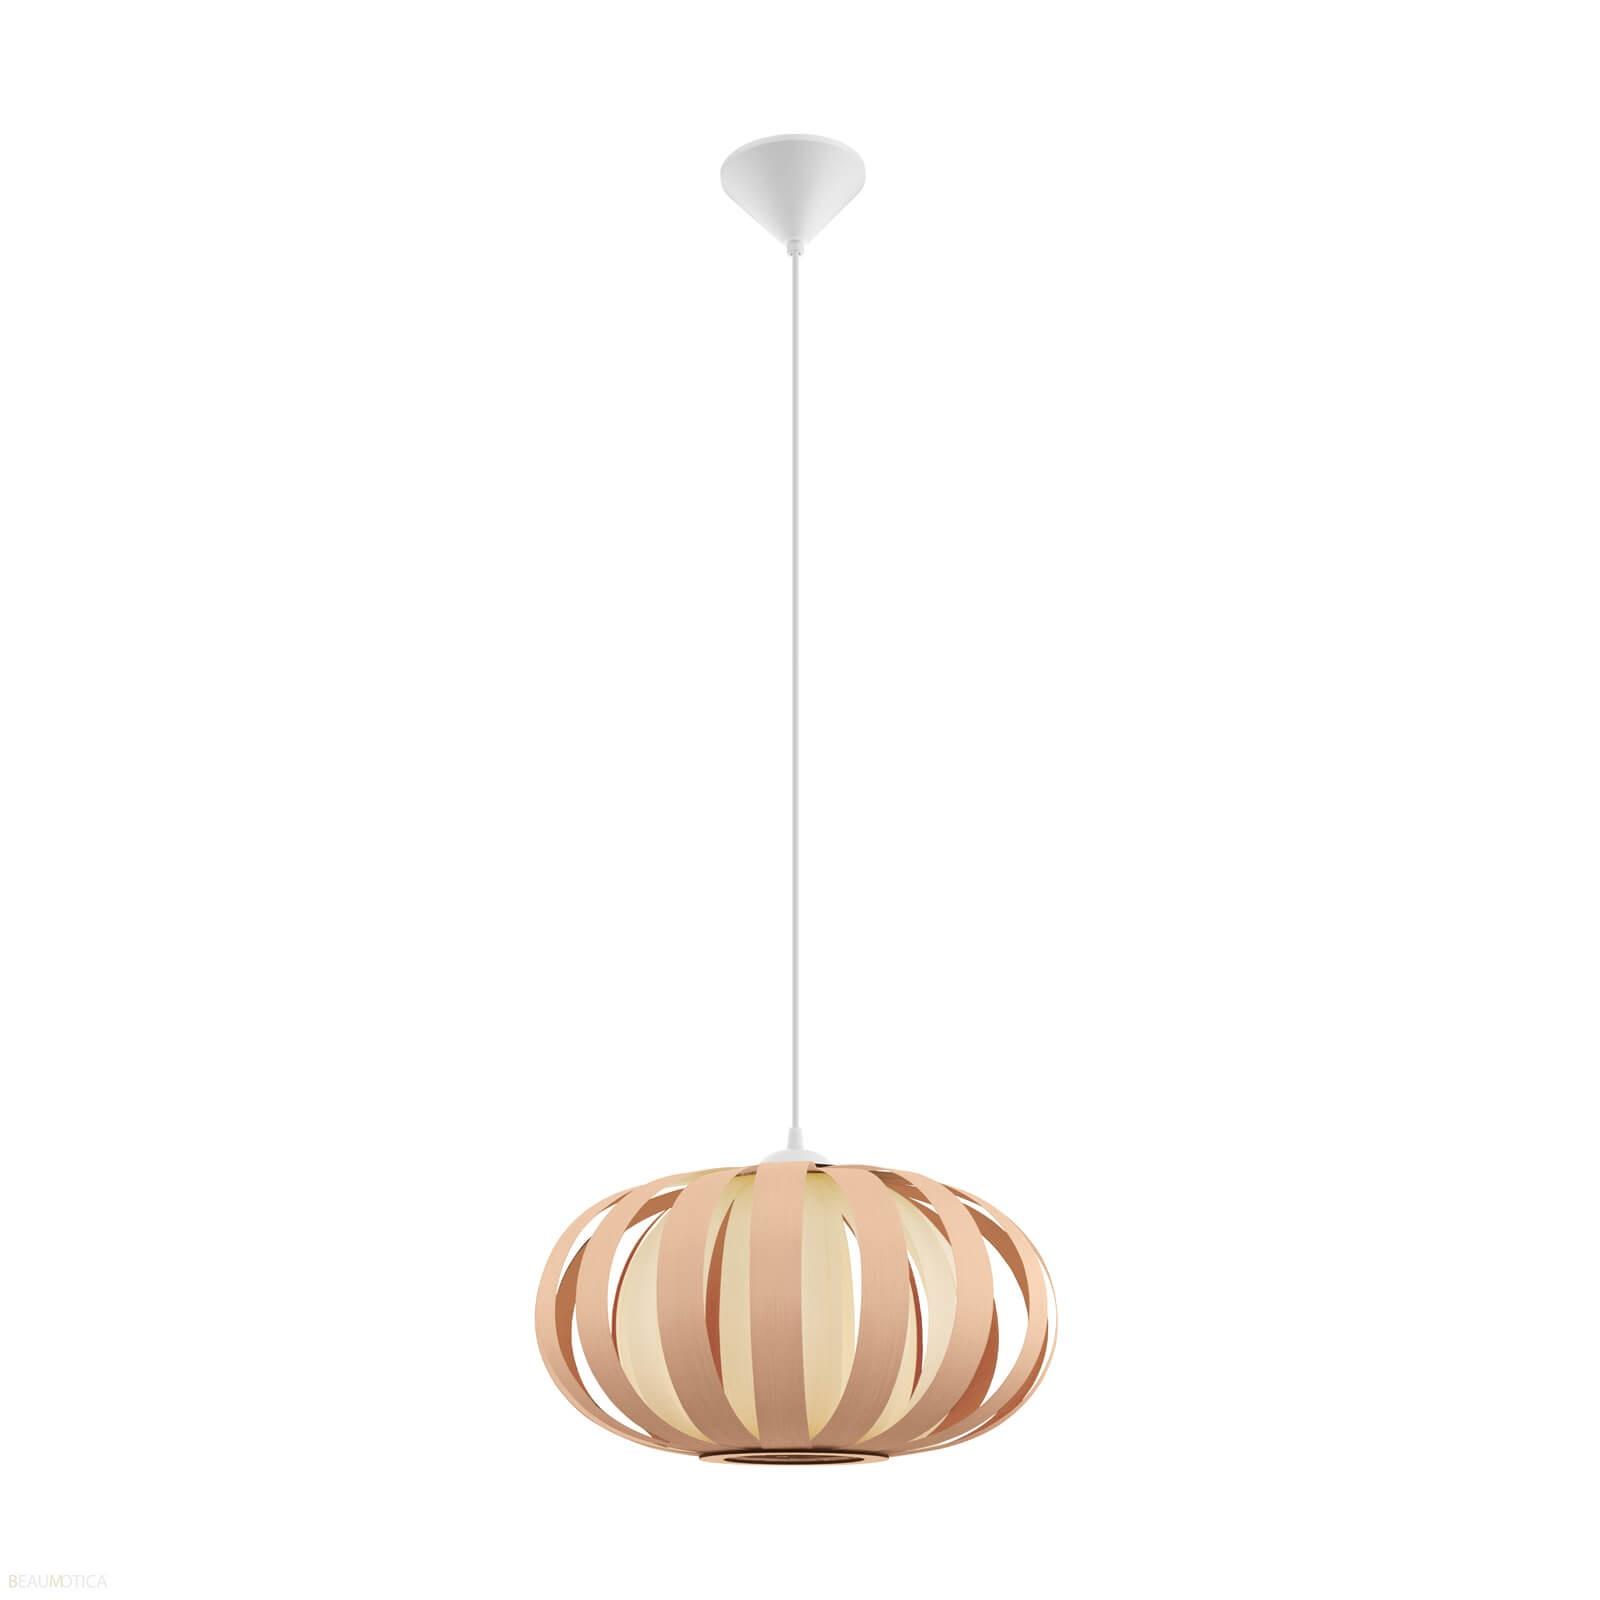 Bekend Eglo Arenella Hanglamp Bruin-Hout (Ø45 cm) EL08